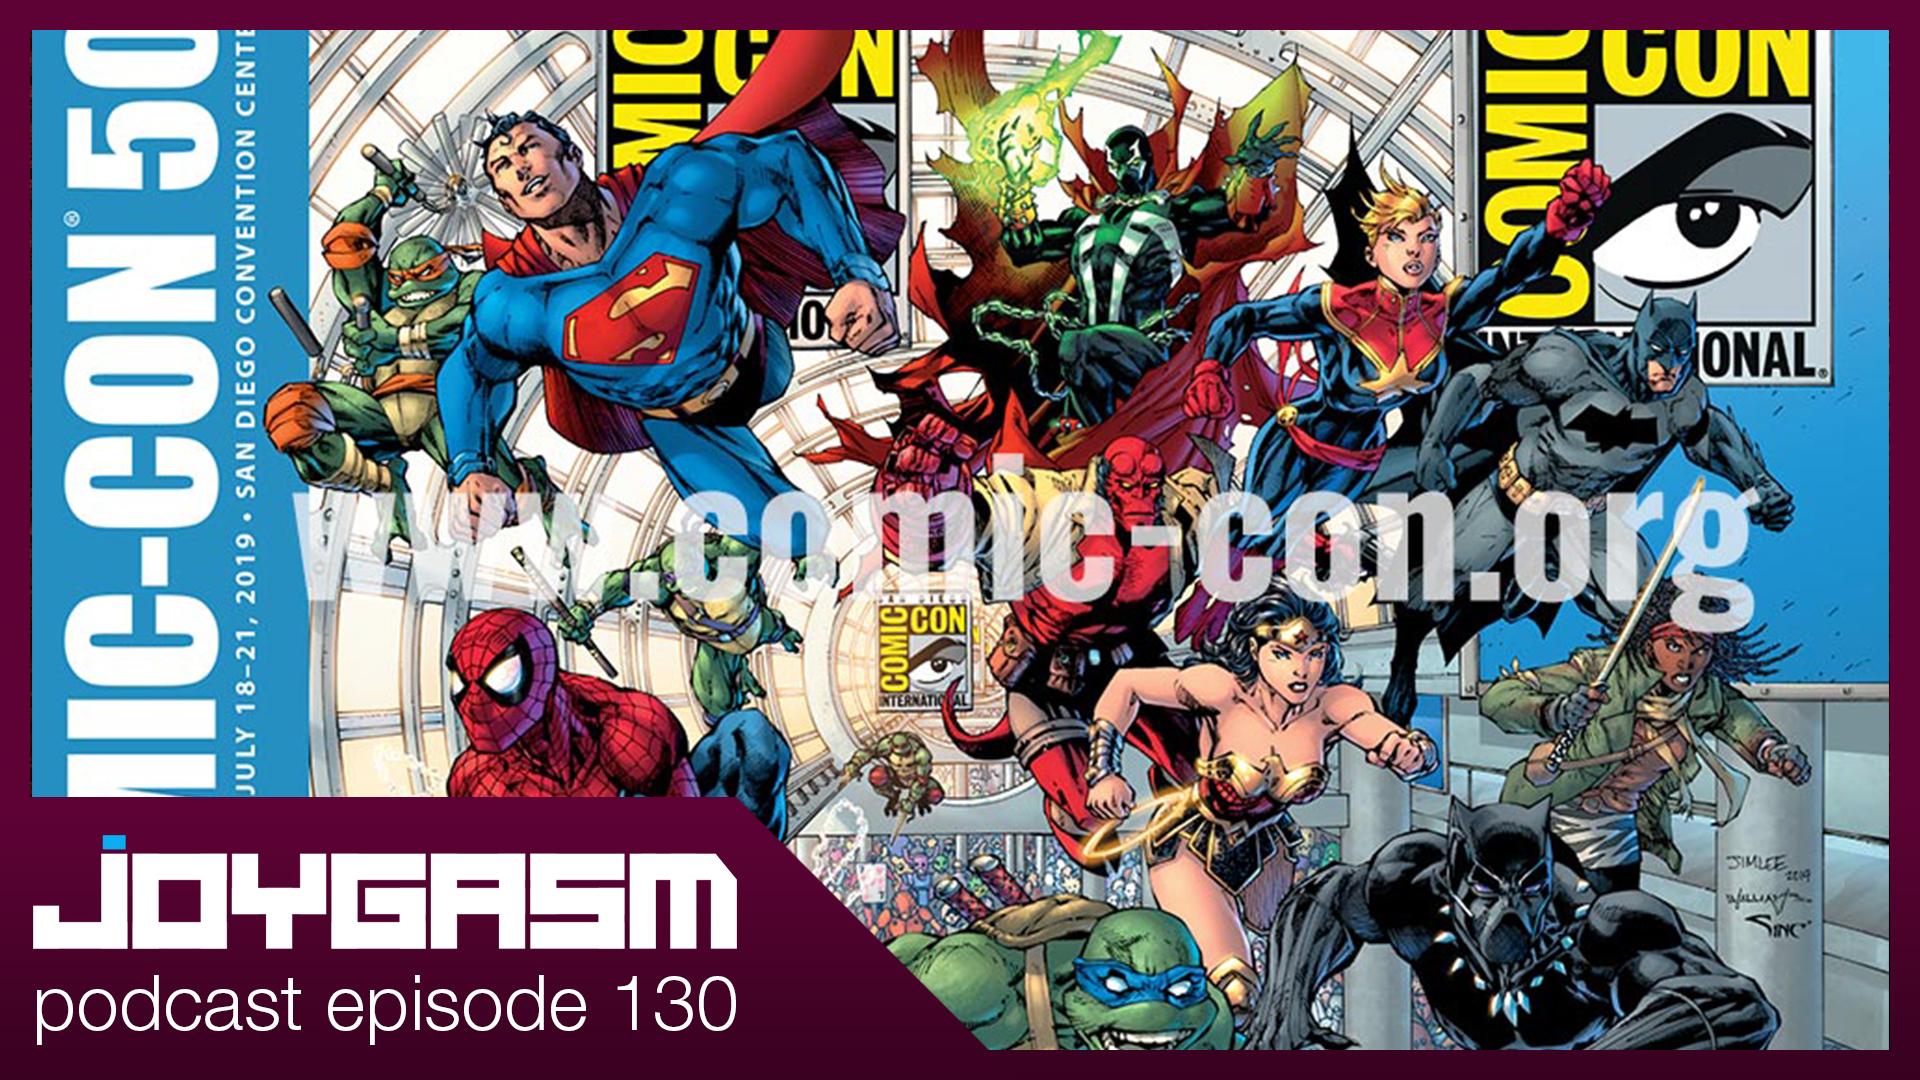 Ep. 130: San Diego Comic Con 2019 Expectations